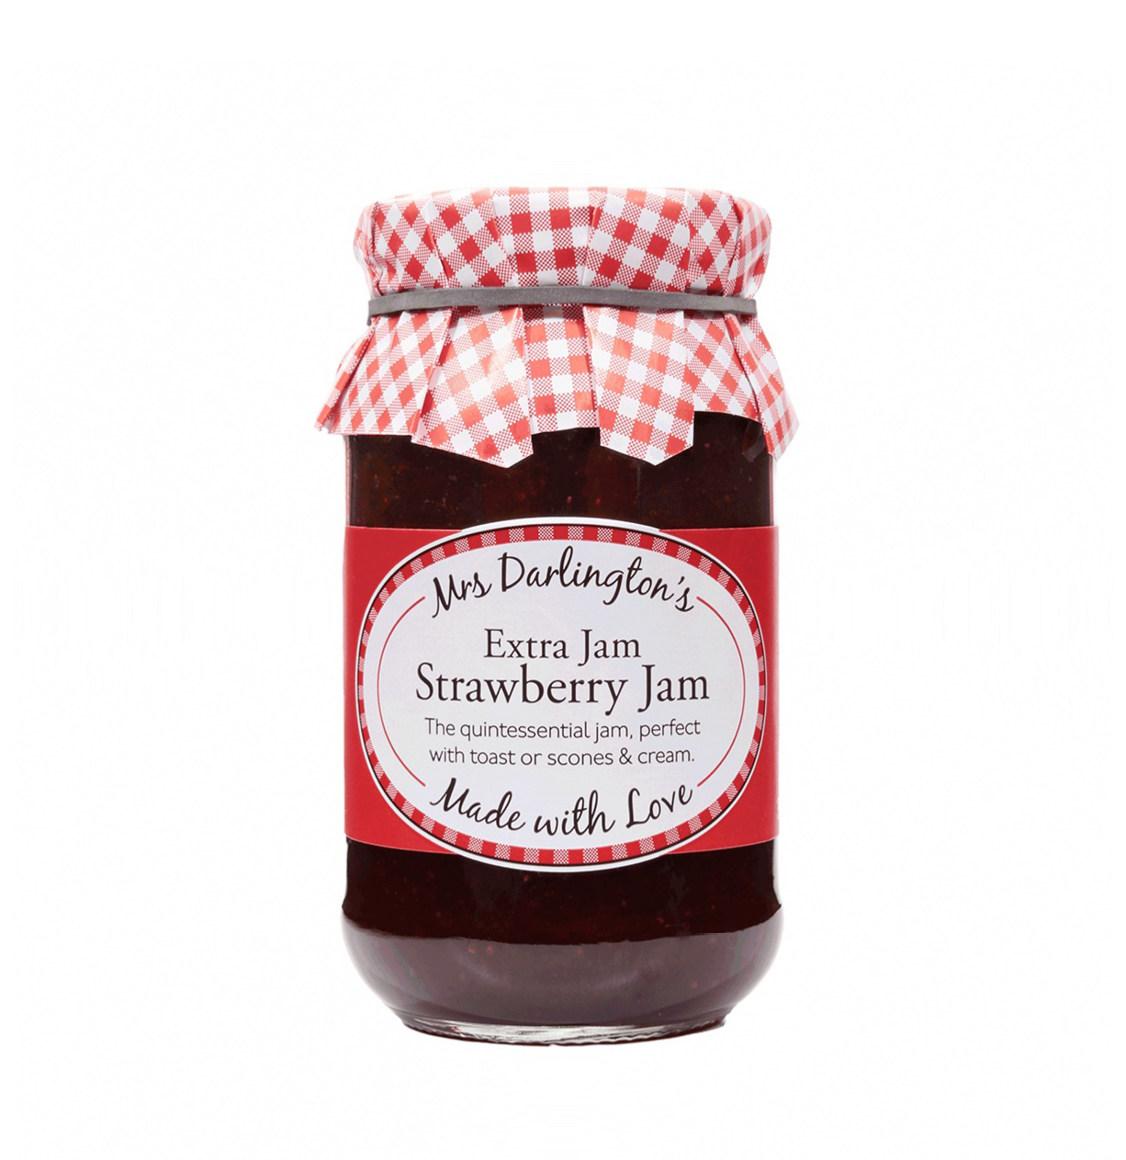 Mrs Darlington's Extra Jam Μαρμελάδα Φράουλα